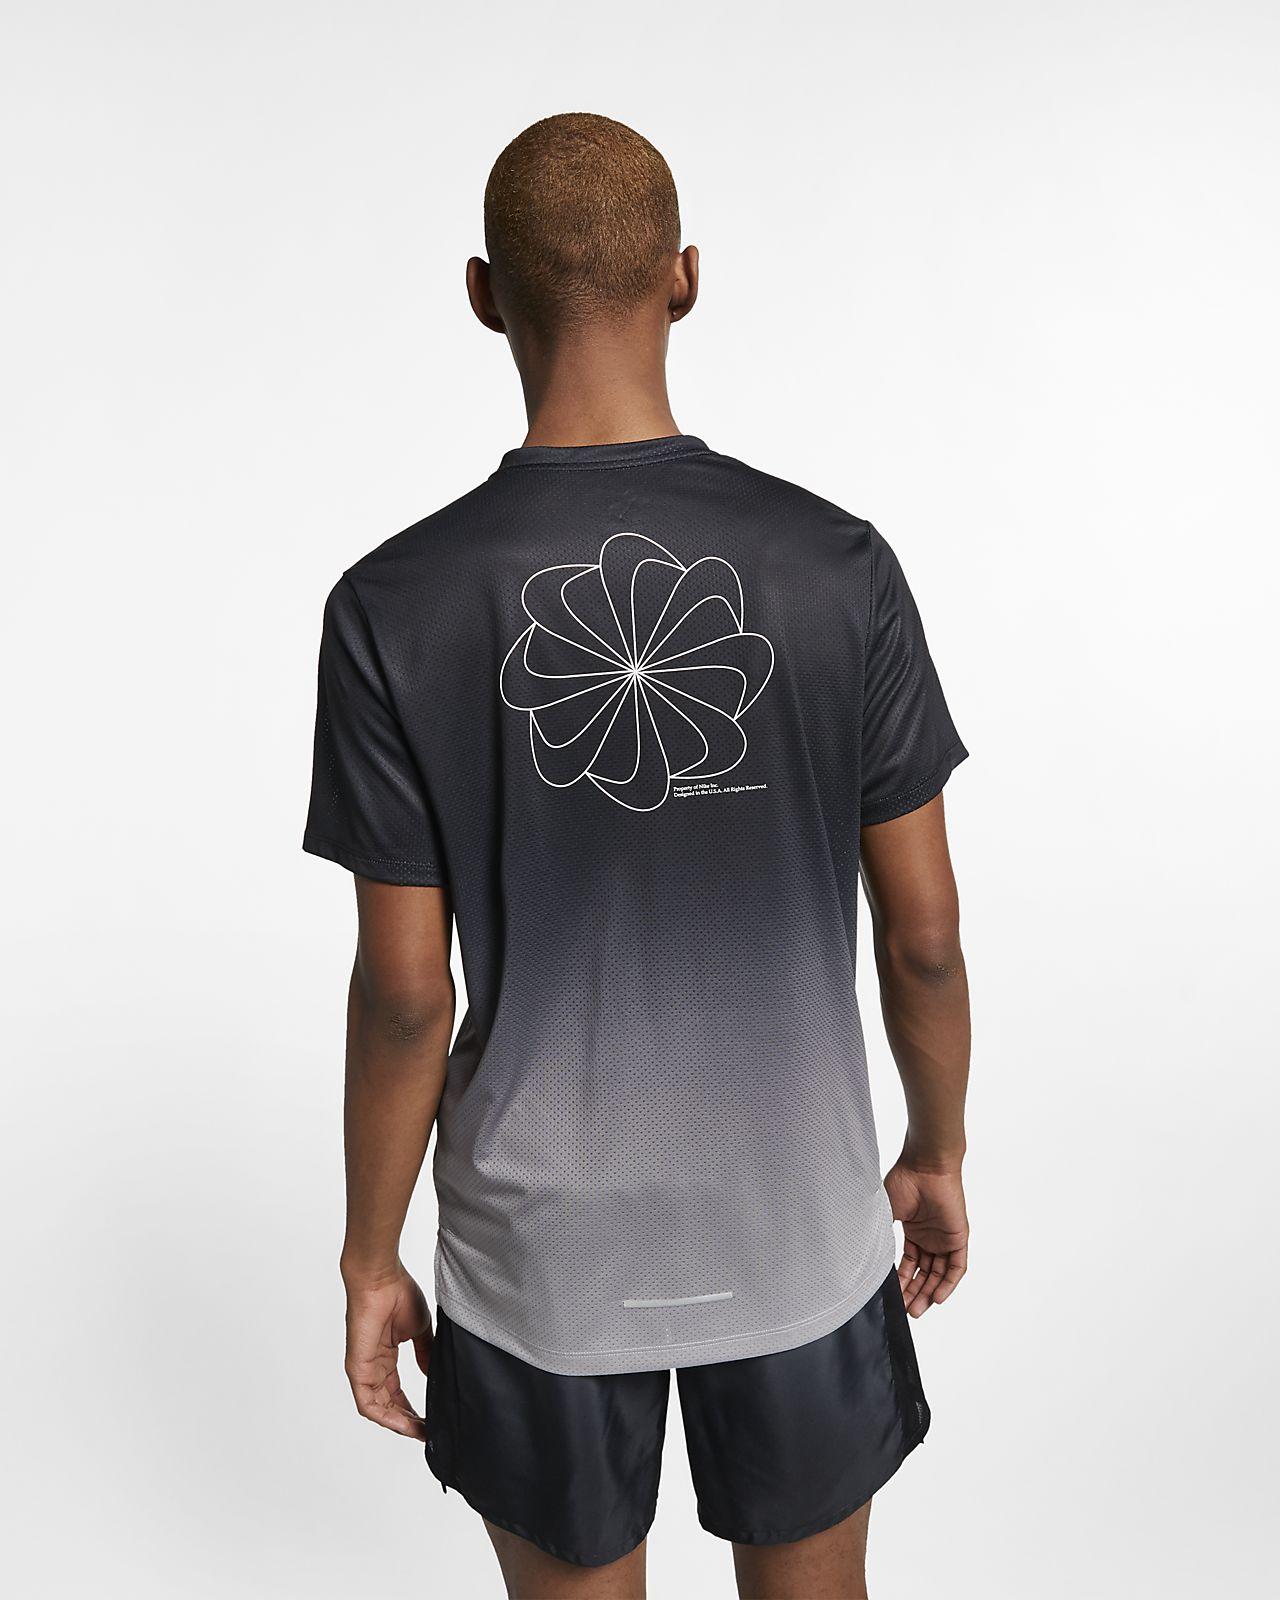 94d0749571816 Nike Mens Printed Miler Running Short Sleeve T Shirt | Azərbaycan ...